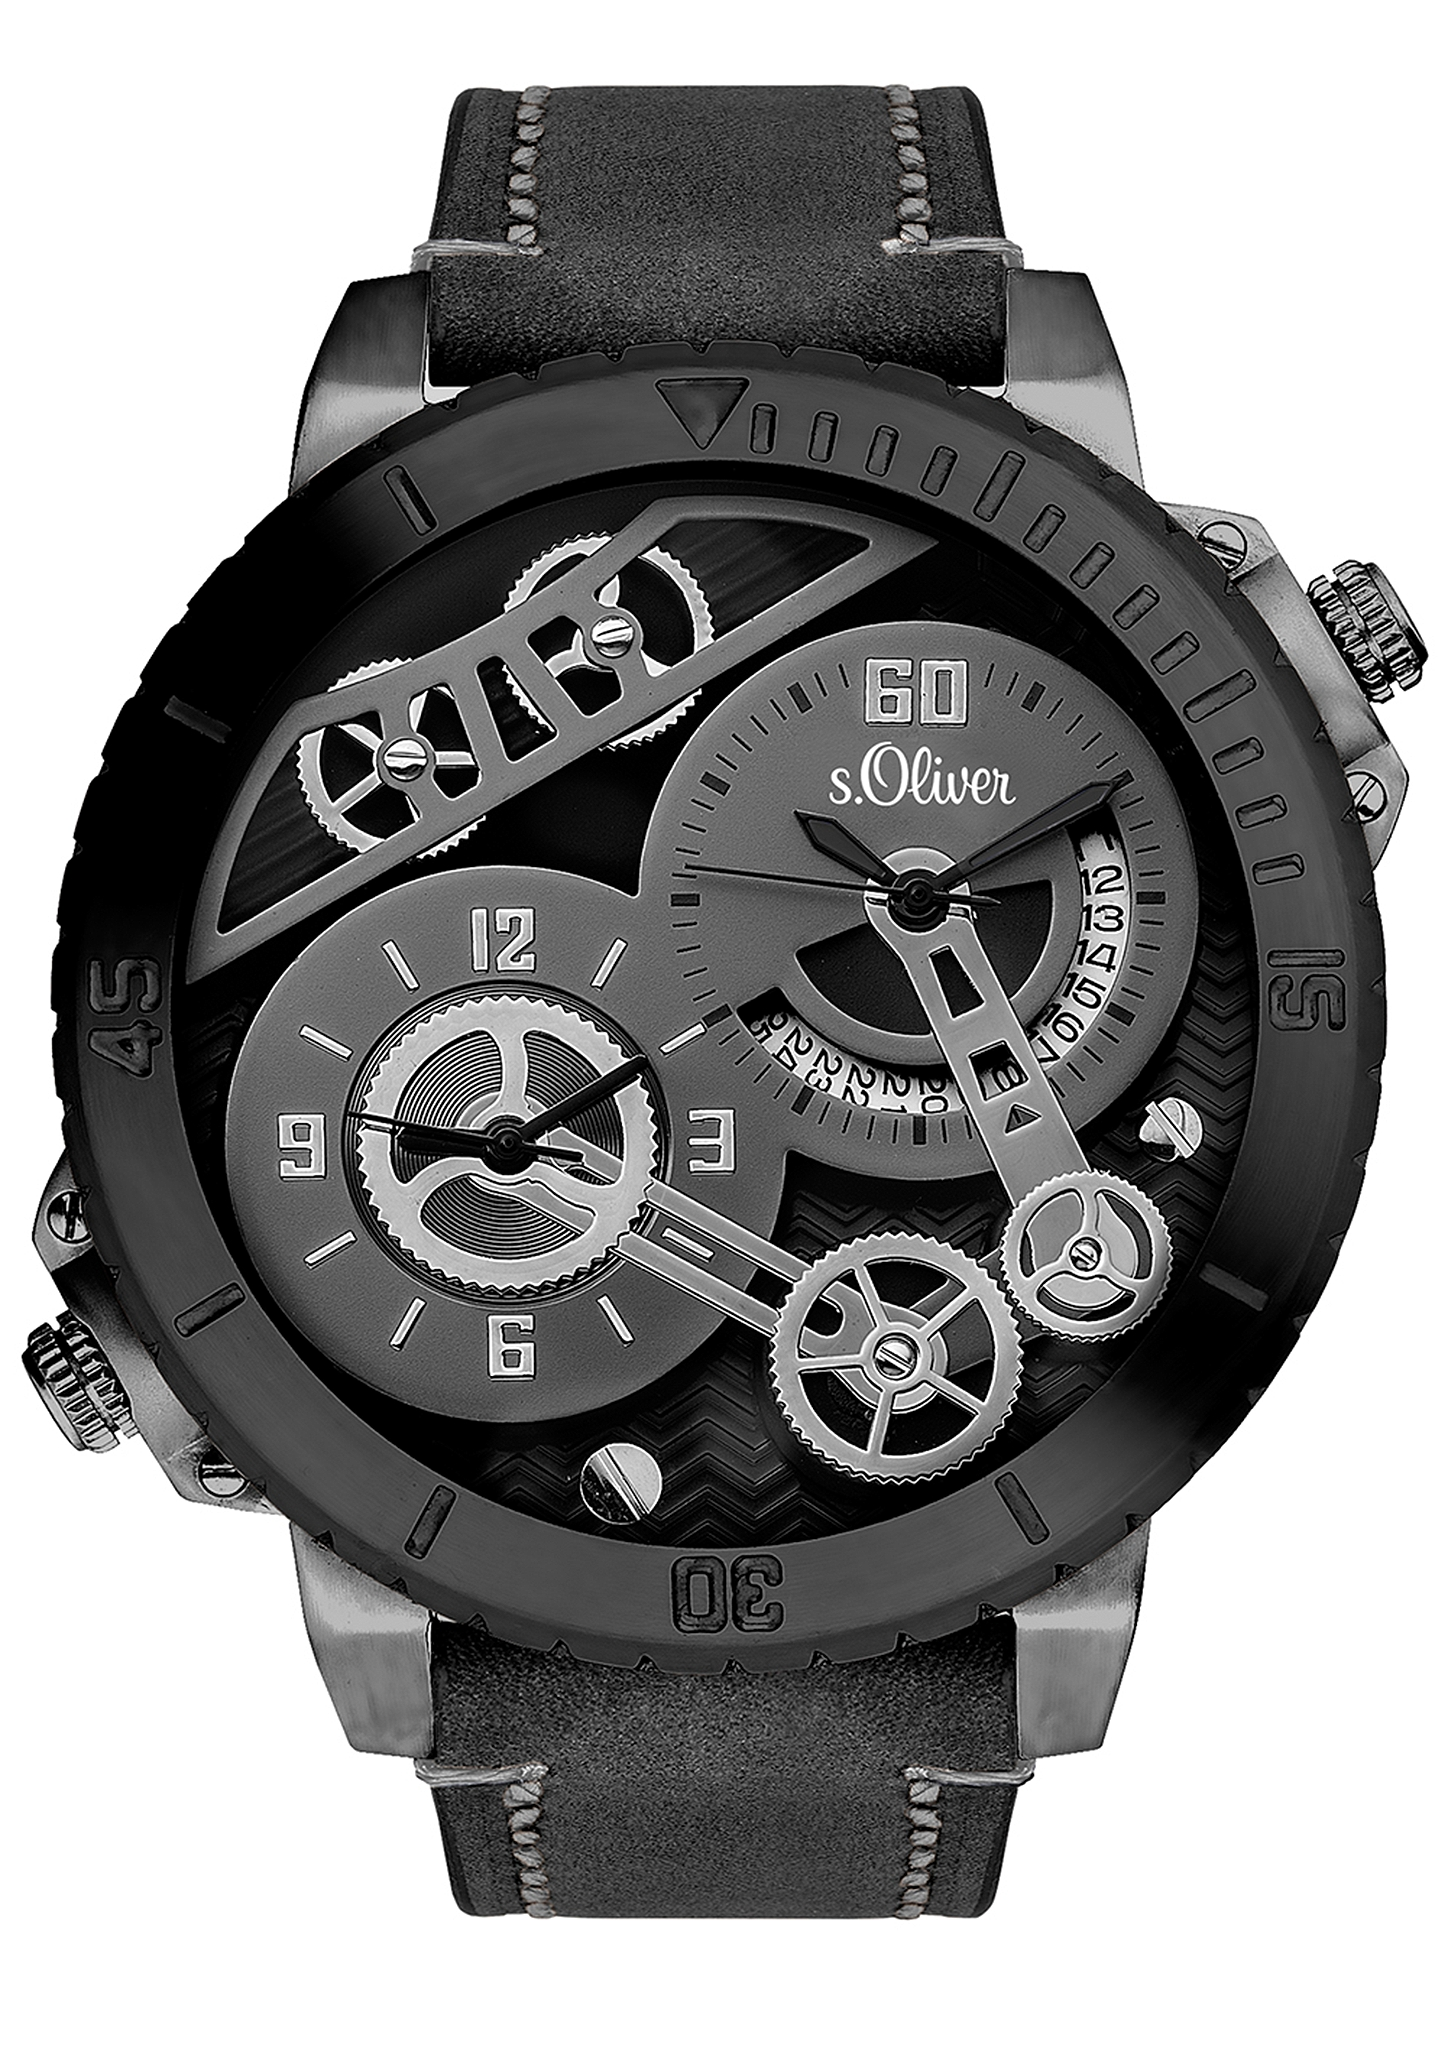 Armbanduhr | Uhren | Grau/schwarz | s.Oliver